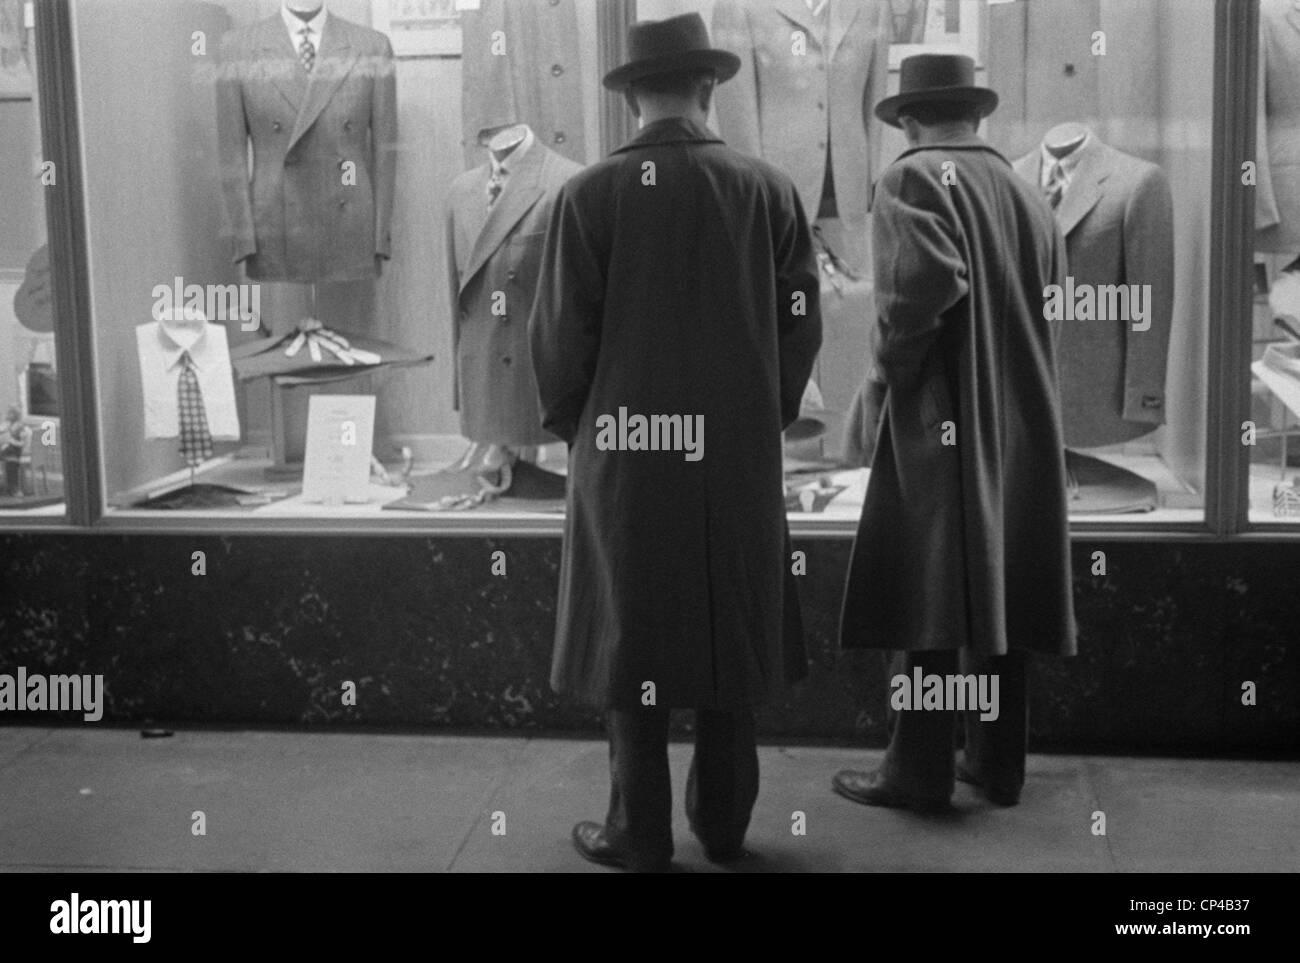 Two men window shopping in Glen Echo, Maryland. 1939. - Stock Image